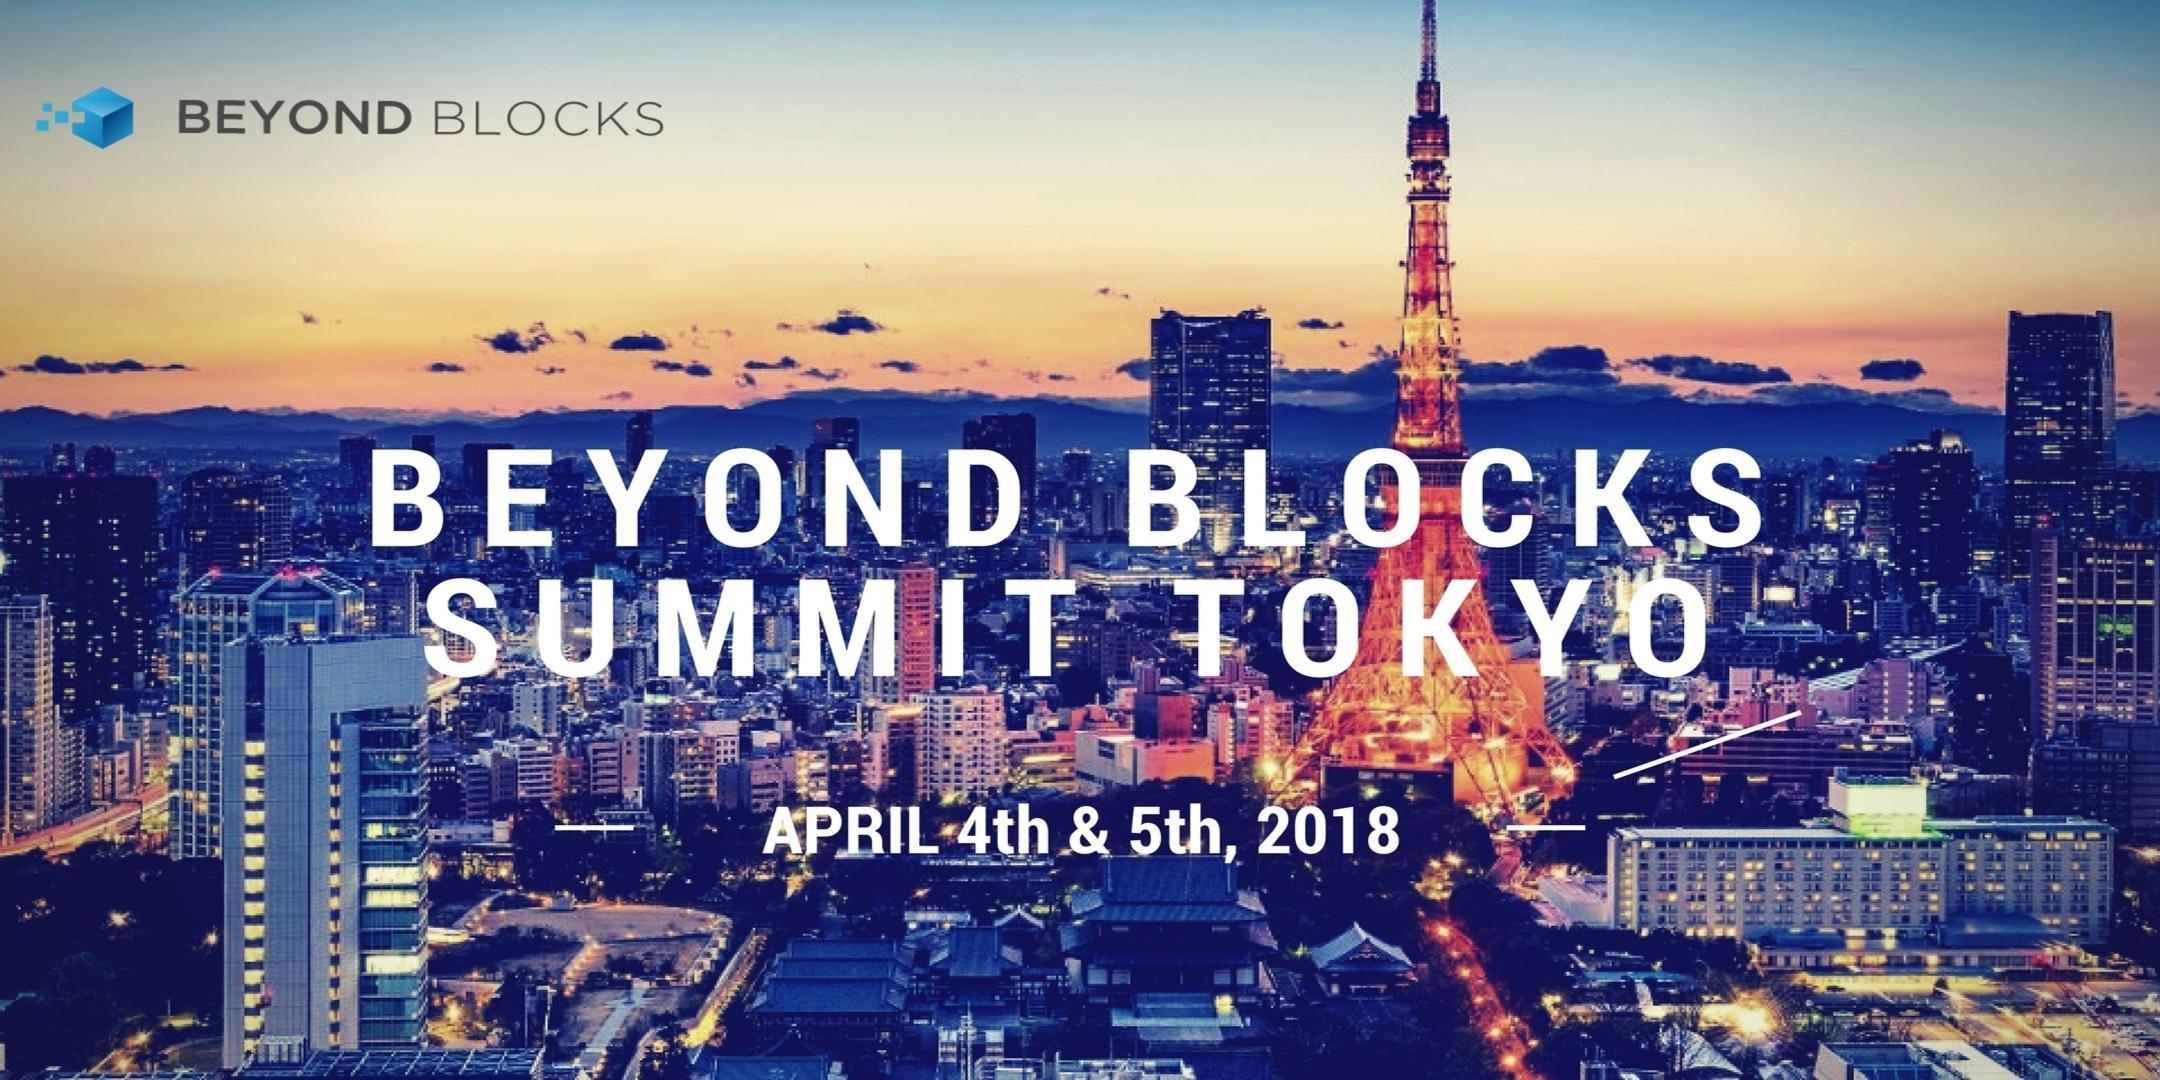 Beyond Blocks Summit Tokyo